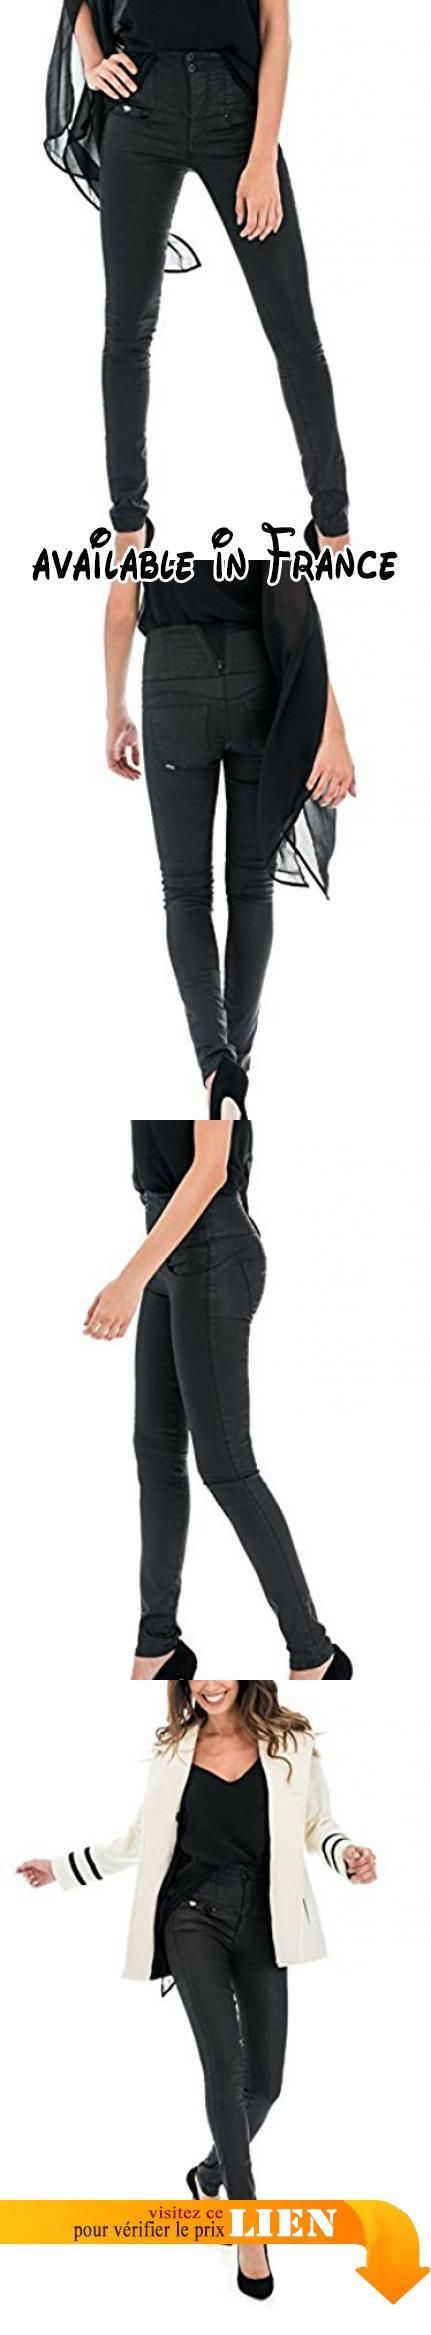 B074WDQBZ8 : Salsa - Pantalon Diva Slim avec enduit - Femme - Noir.